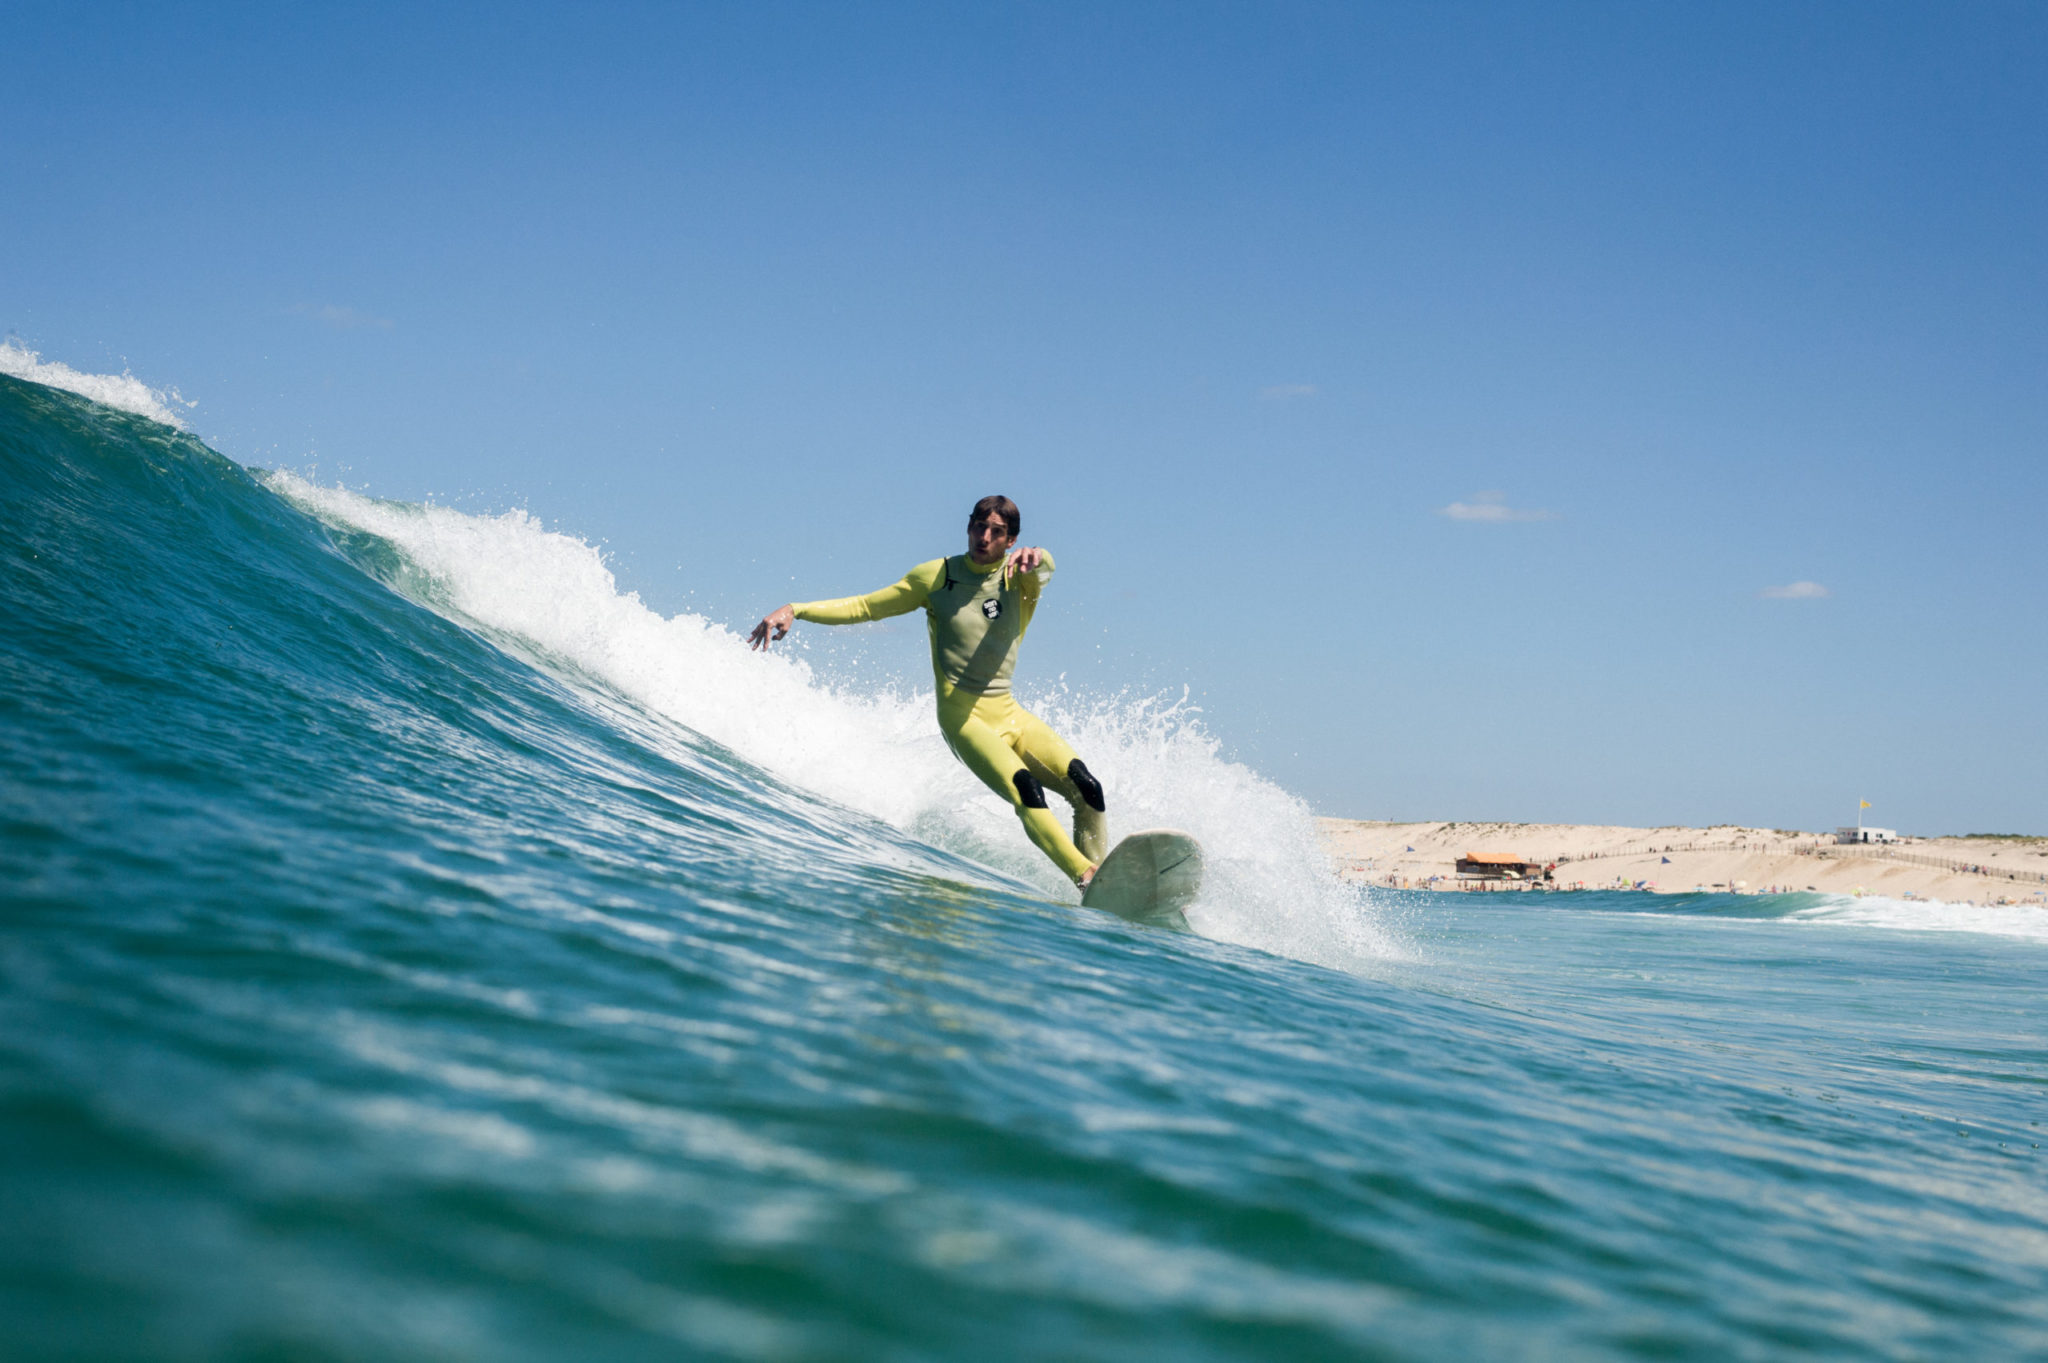 cachalot surfboards planche surf handmade artisan shaper hollow bois merguez nil puissant